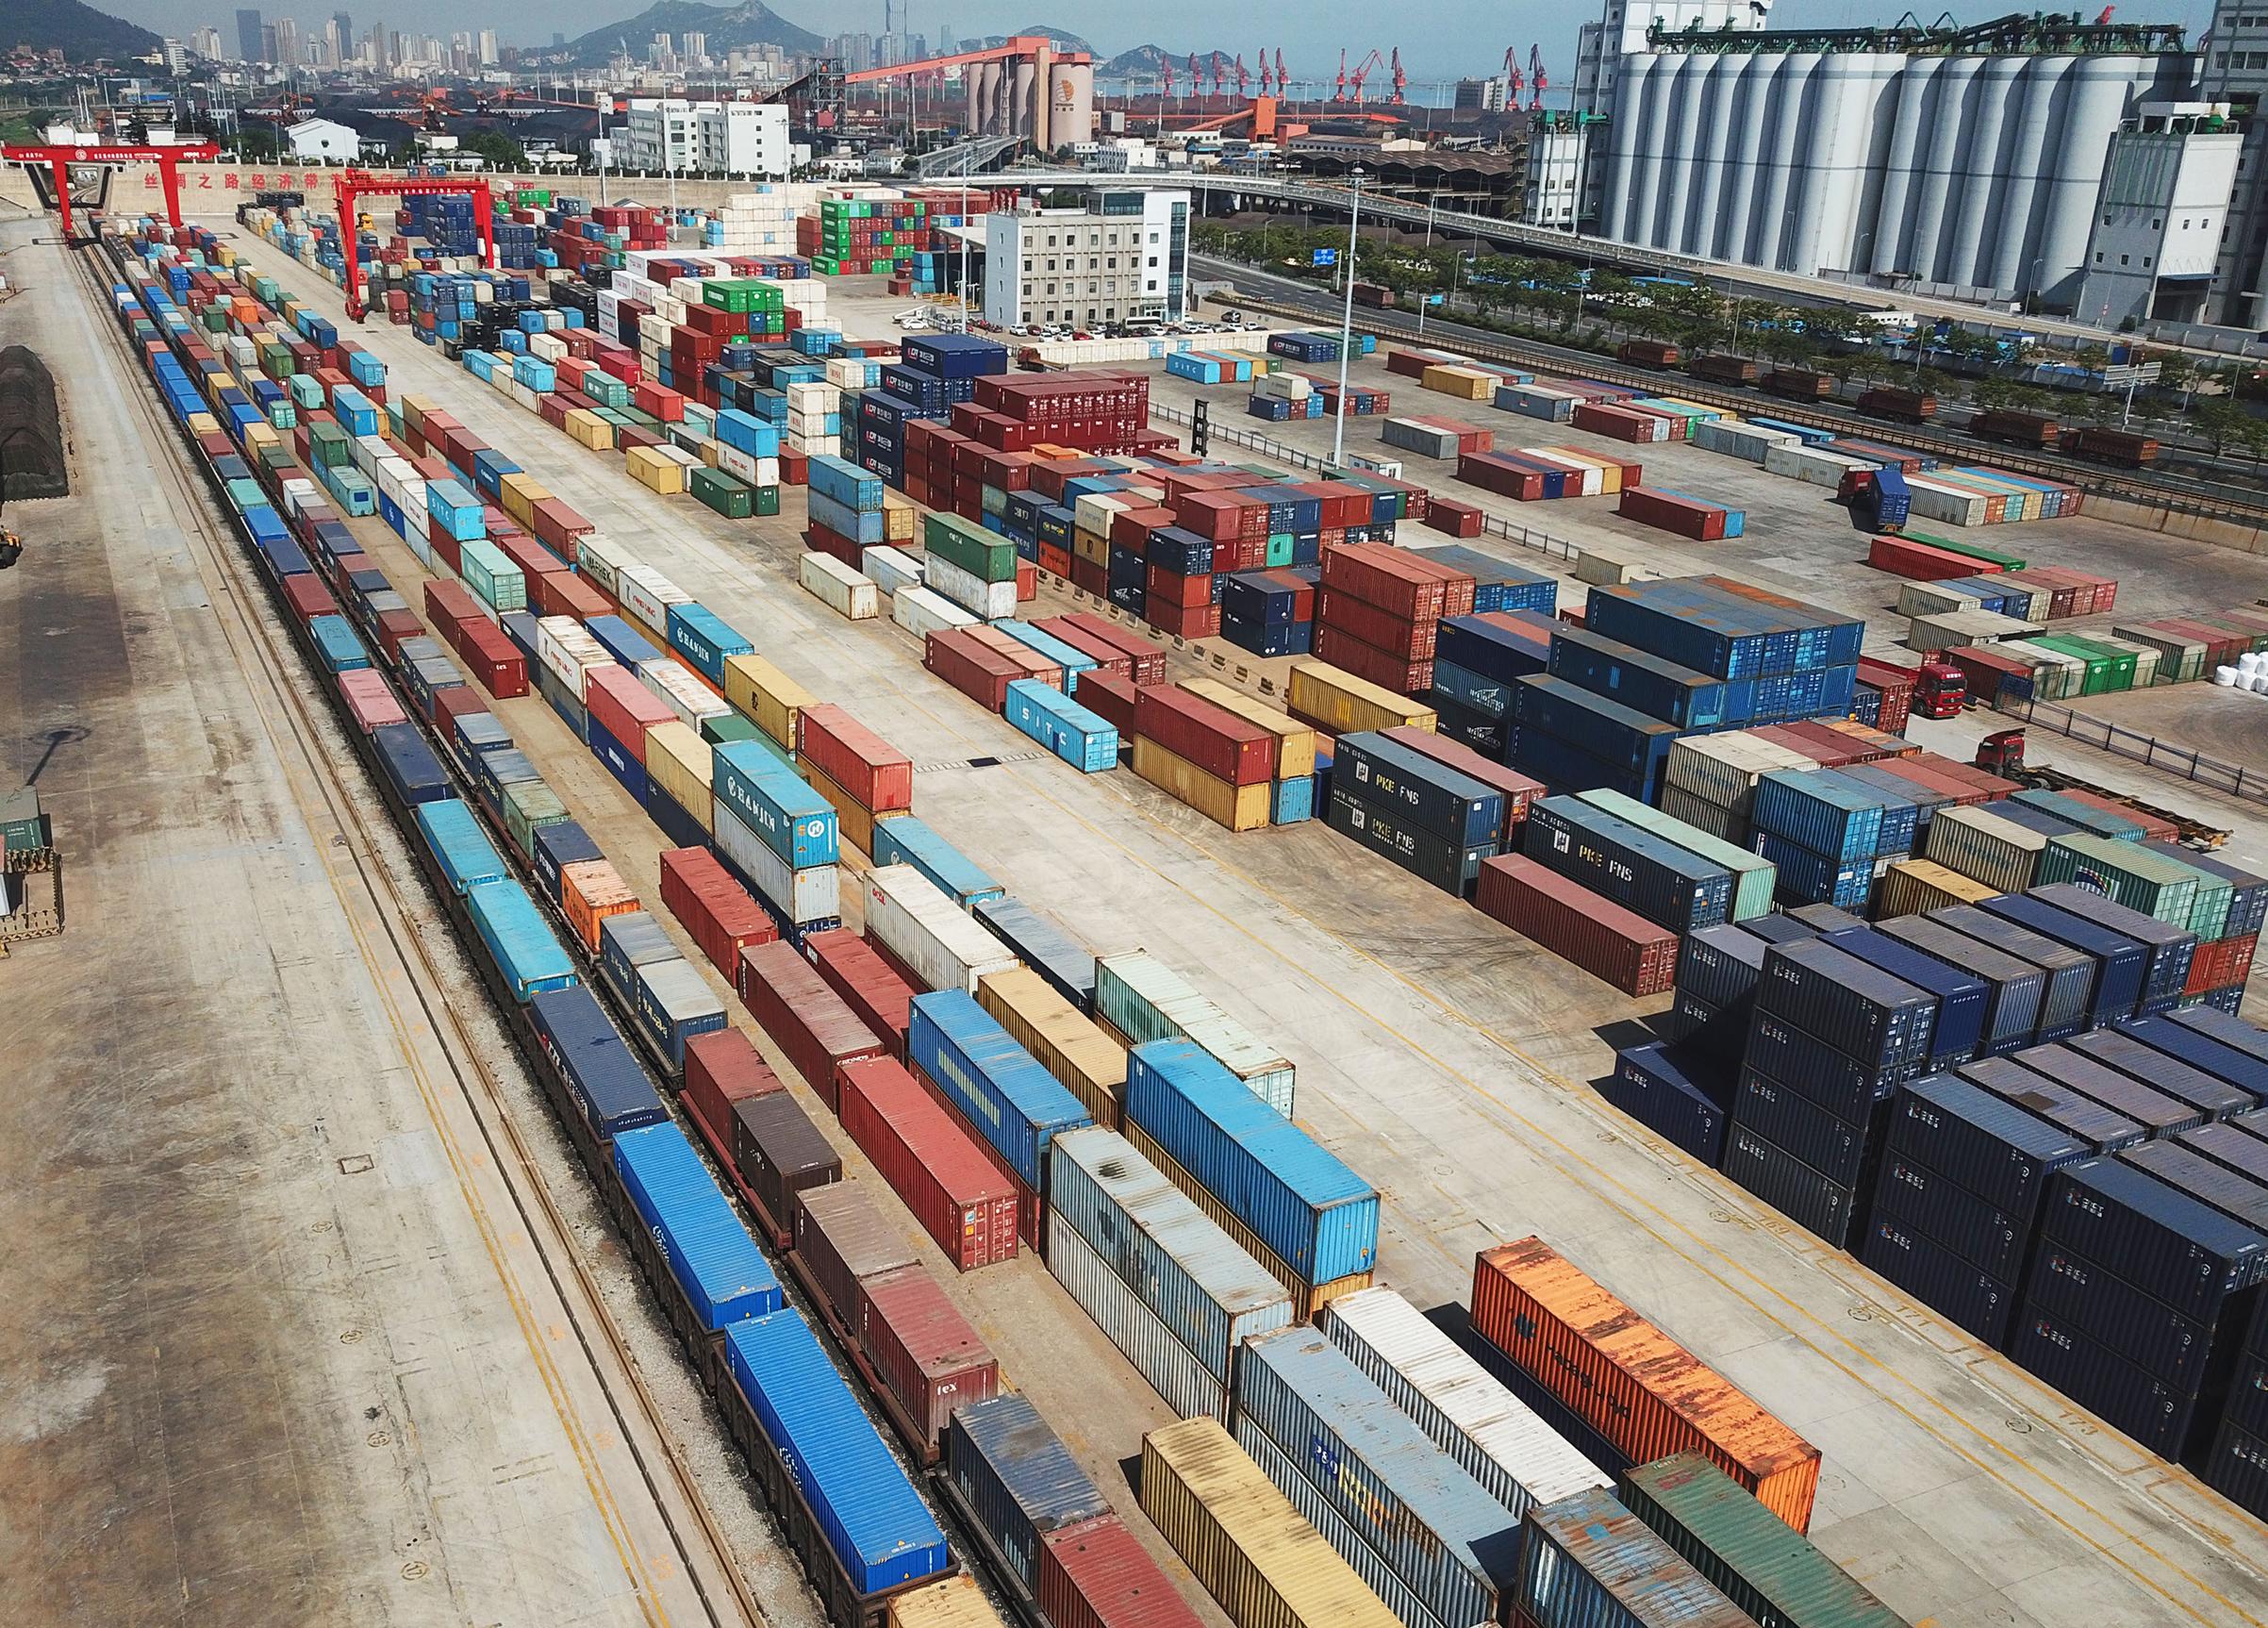 Shipping containers at the China-Kazakhstan logistics terminal on May 31, 2018 in Lianyungang, Jiangsu Province of China.